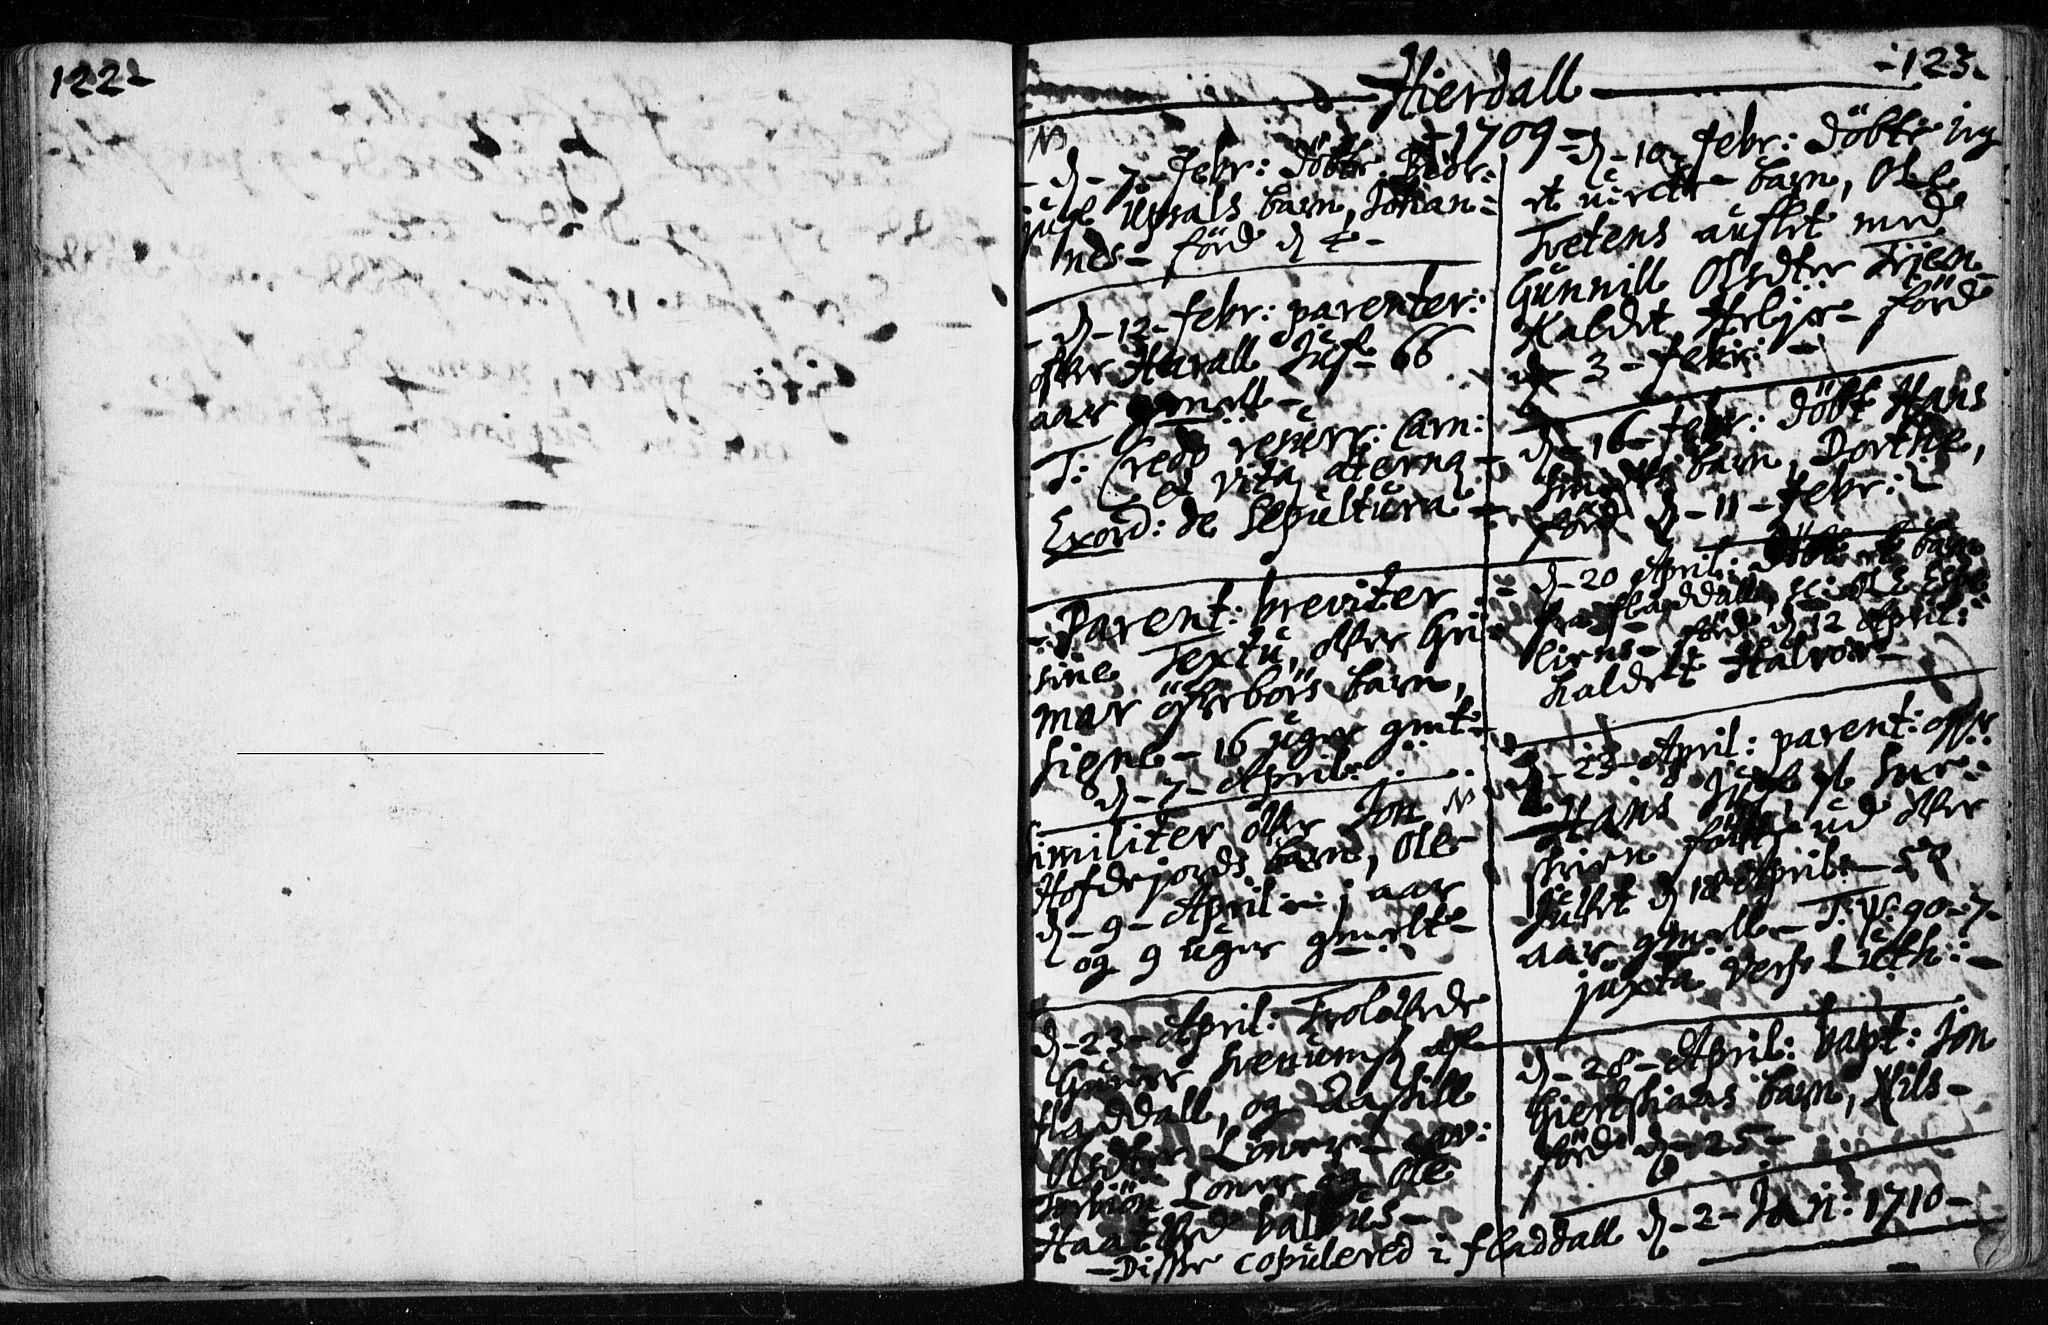 SAKO, Hjartdal kirkebøker, F/Fa/L0001: Ministerialbok nr. I 1, 1685-1714, s. 122-123